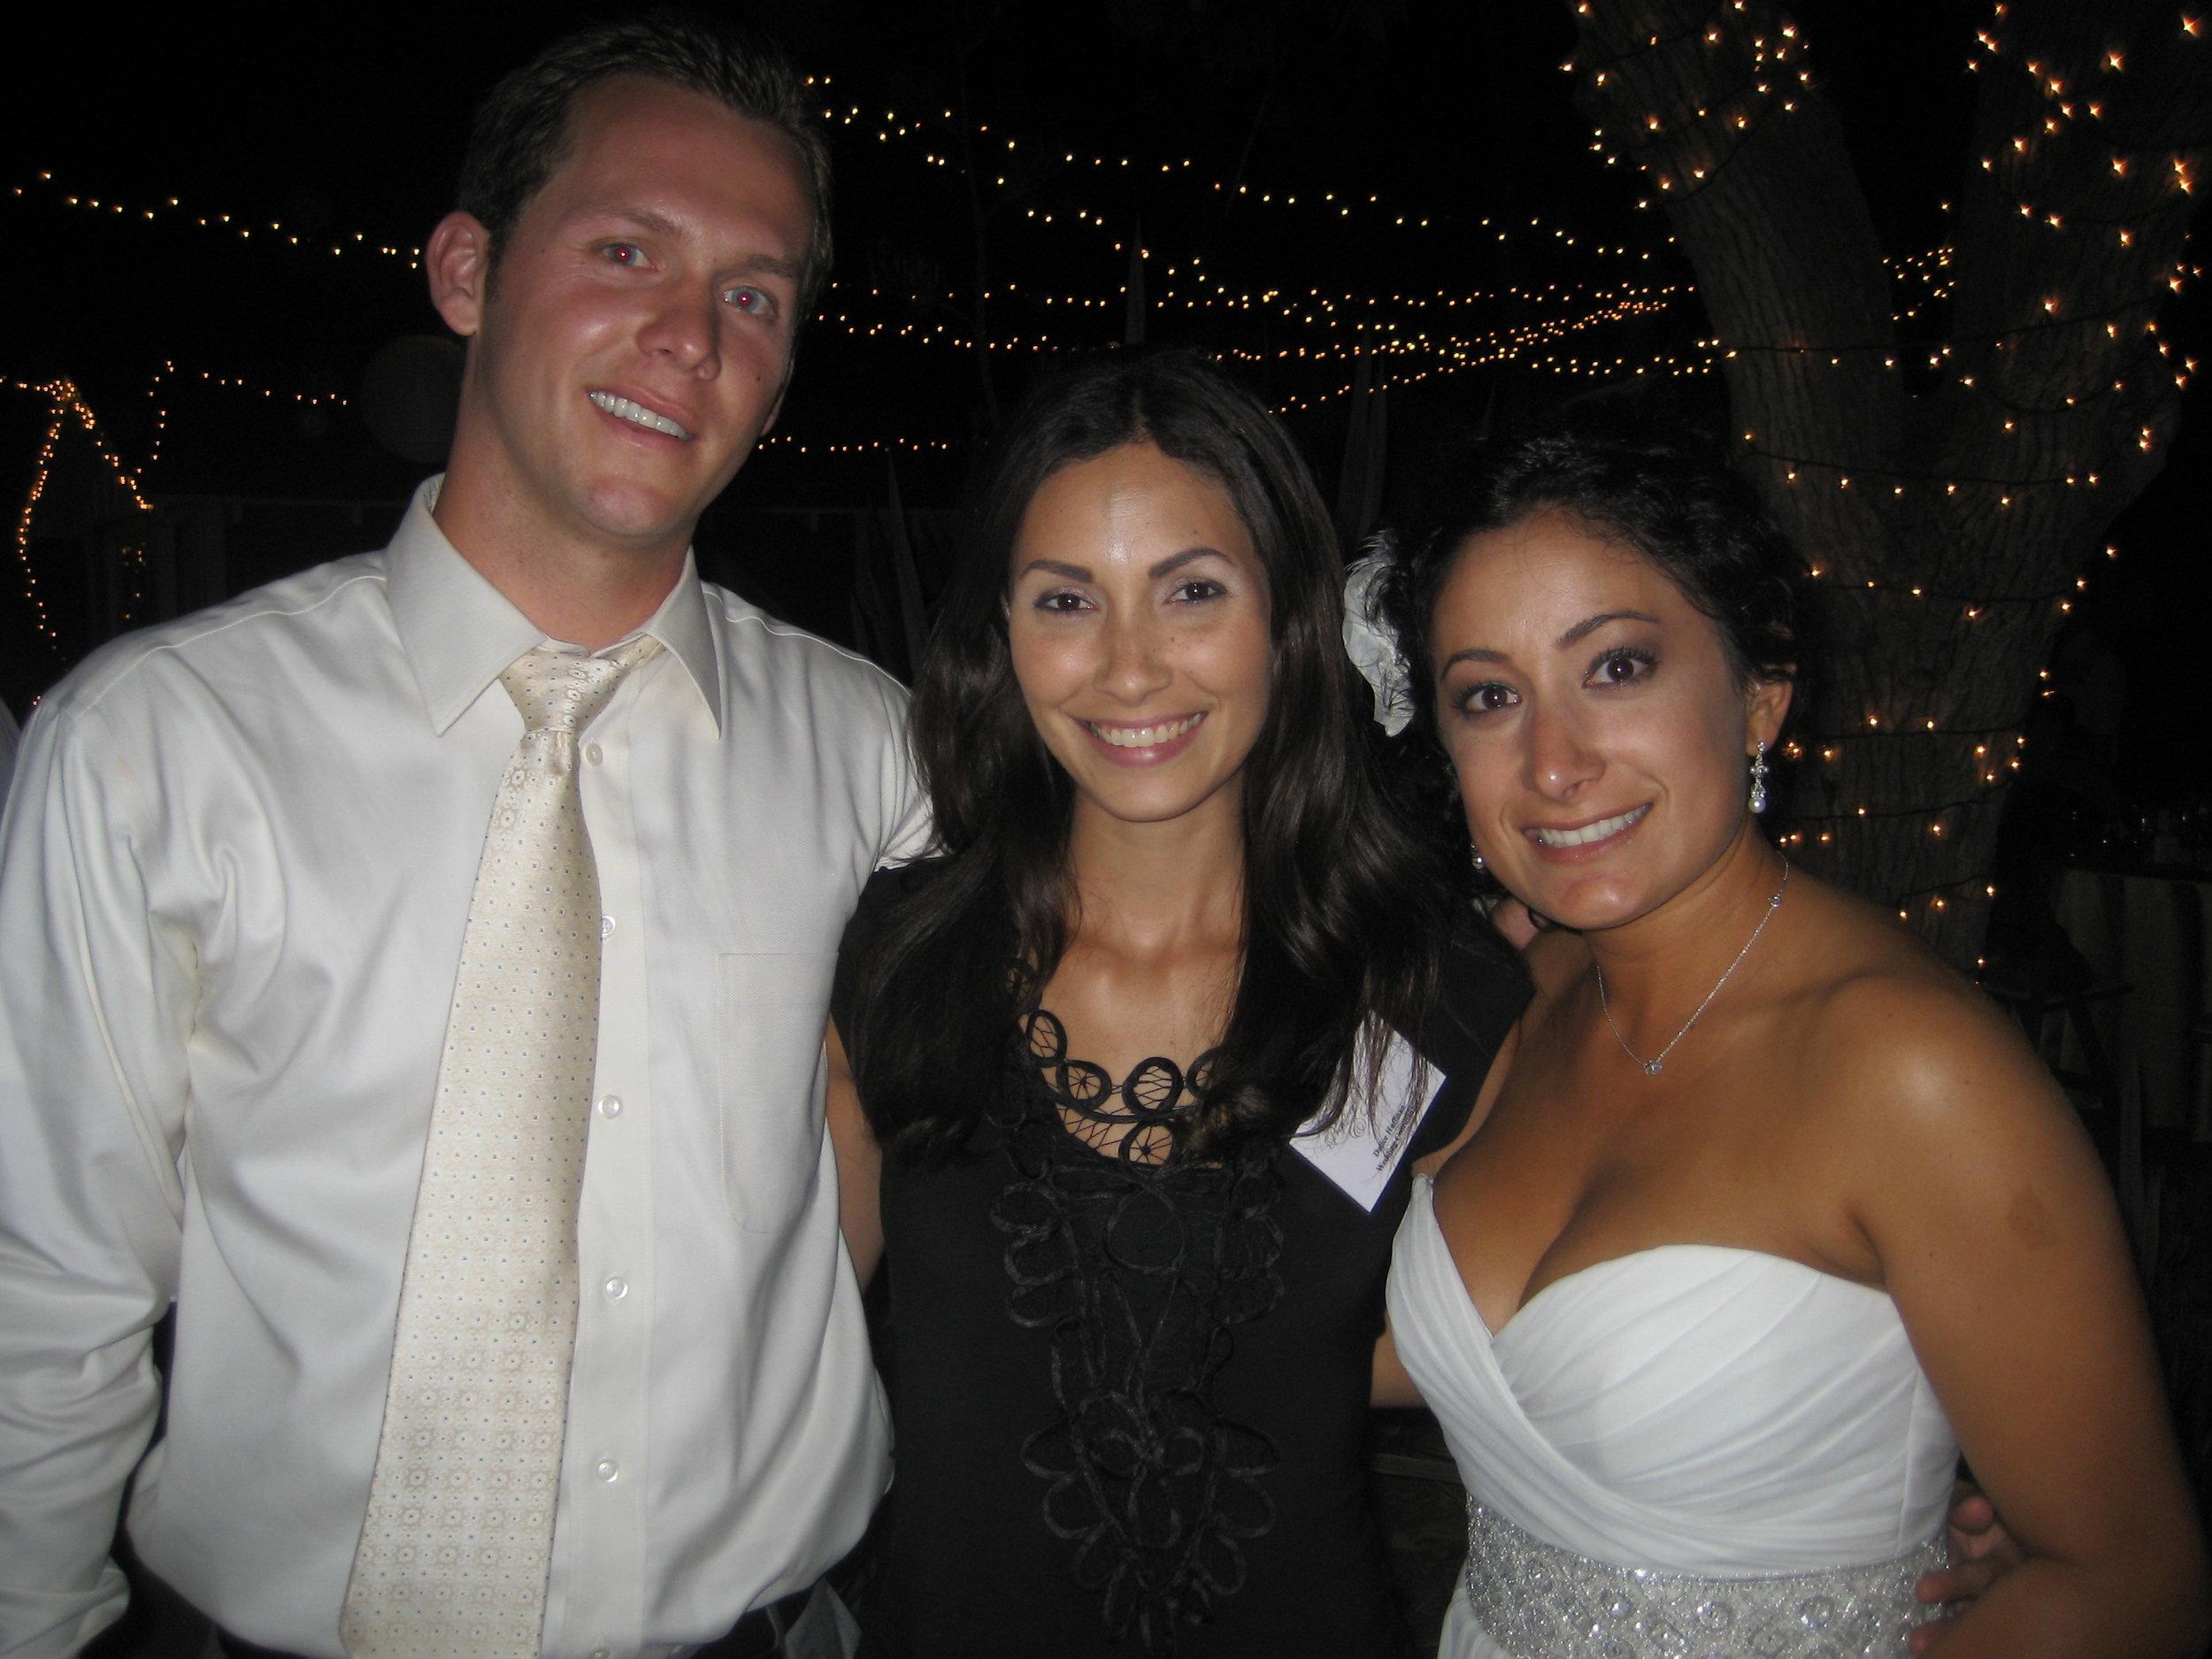 Dalice, Andrea and Ben.JPG